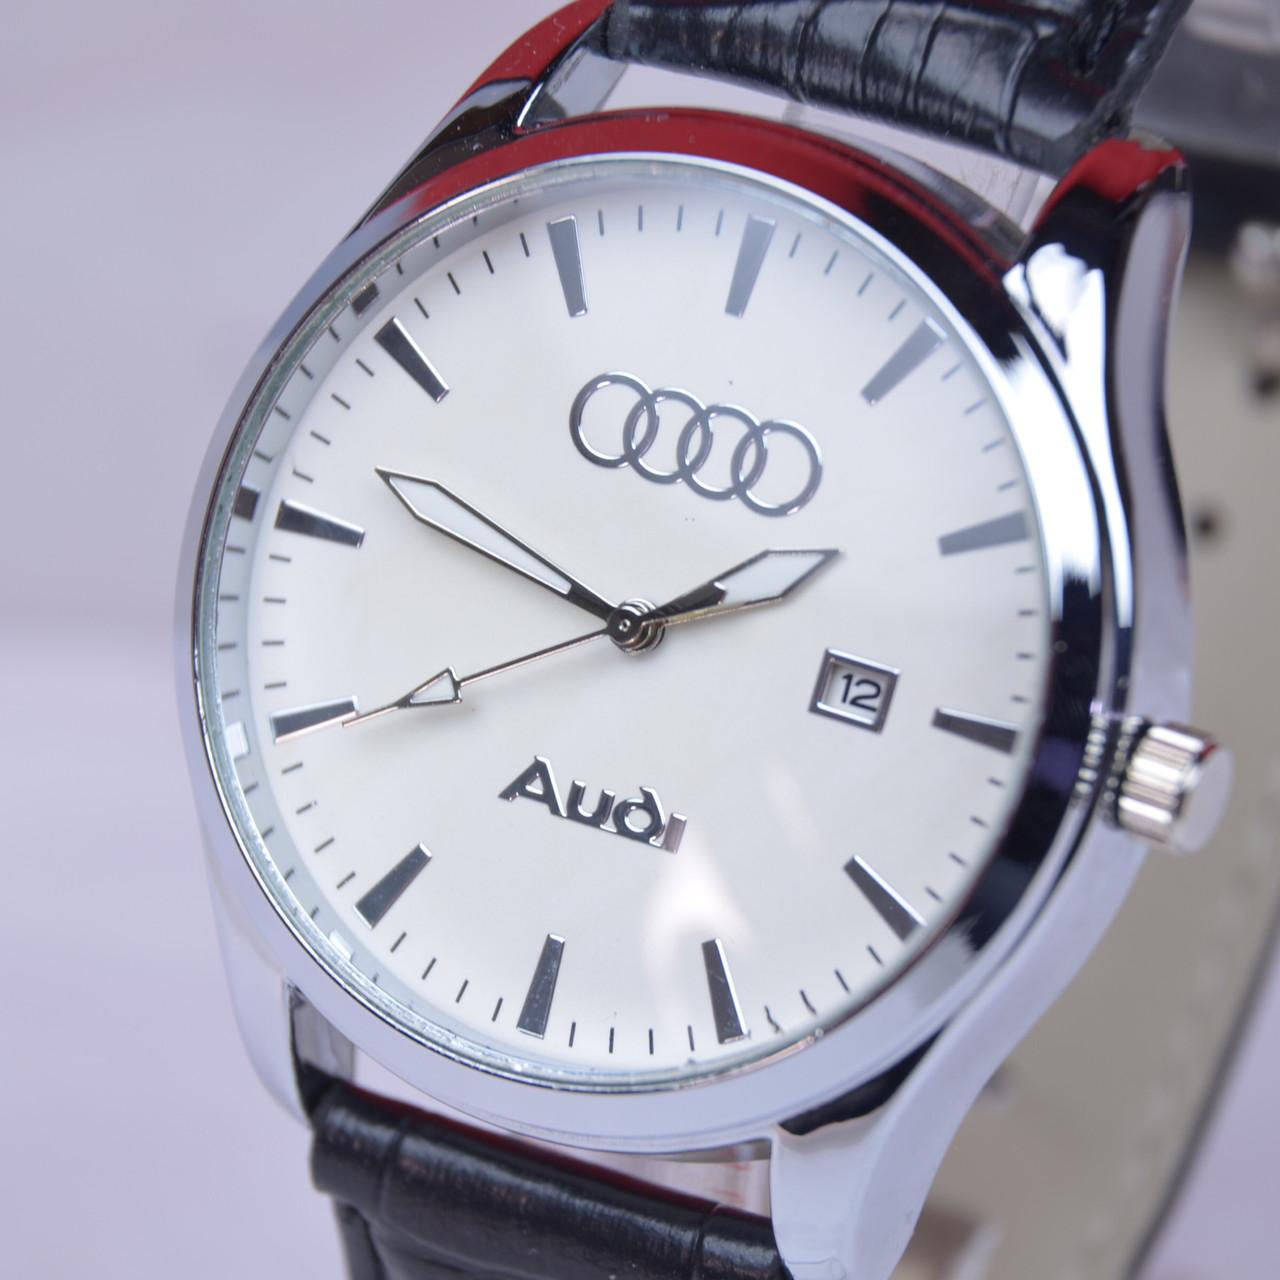 Мужские наручные часы Audi (7068-2) кварц календарь